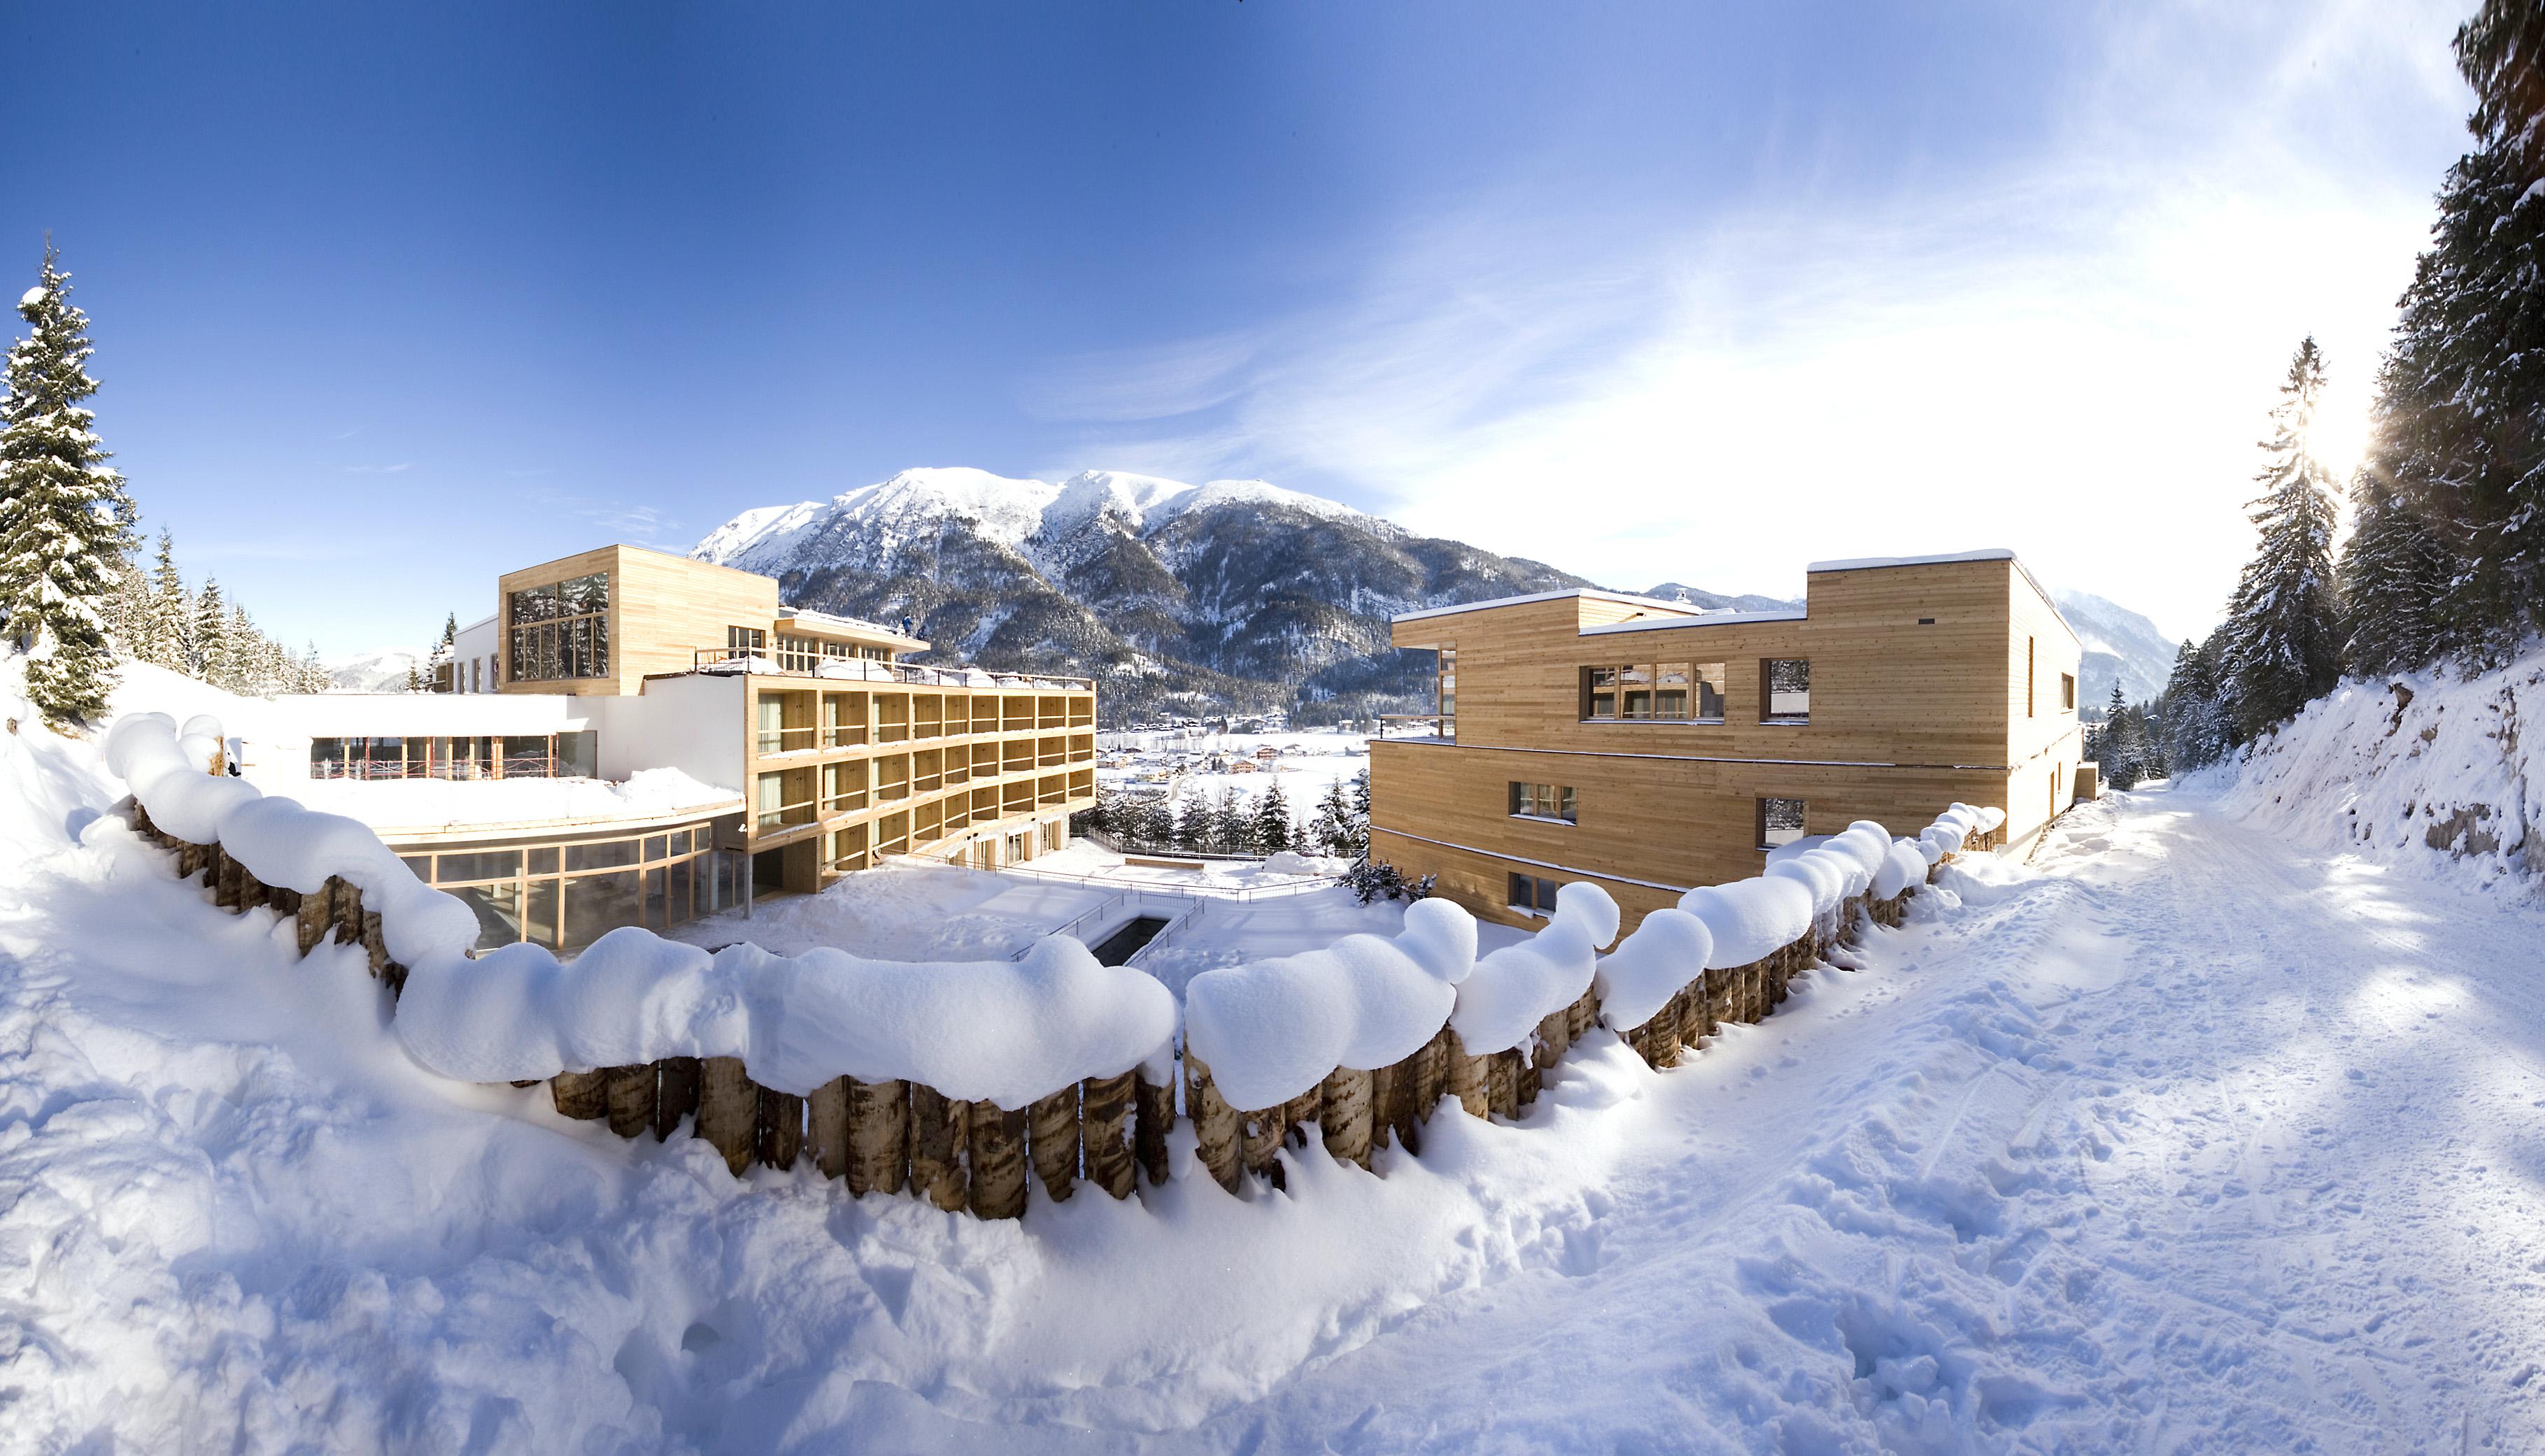 Das kronthaler dem himmel so nah astroheute for Design hotel achensee